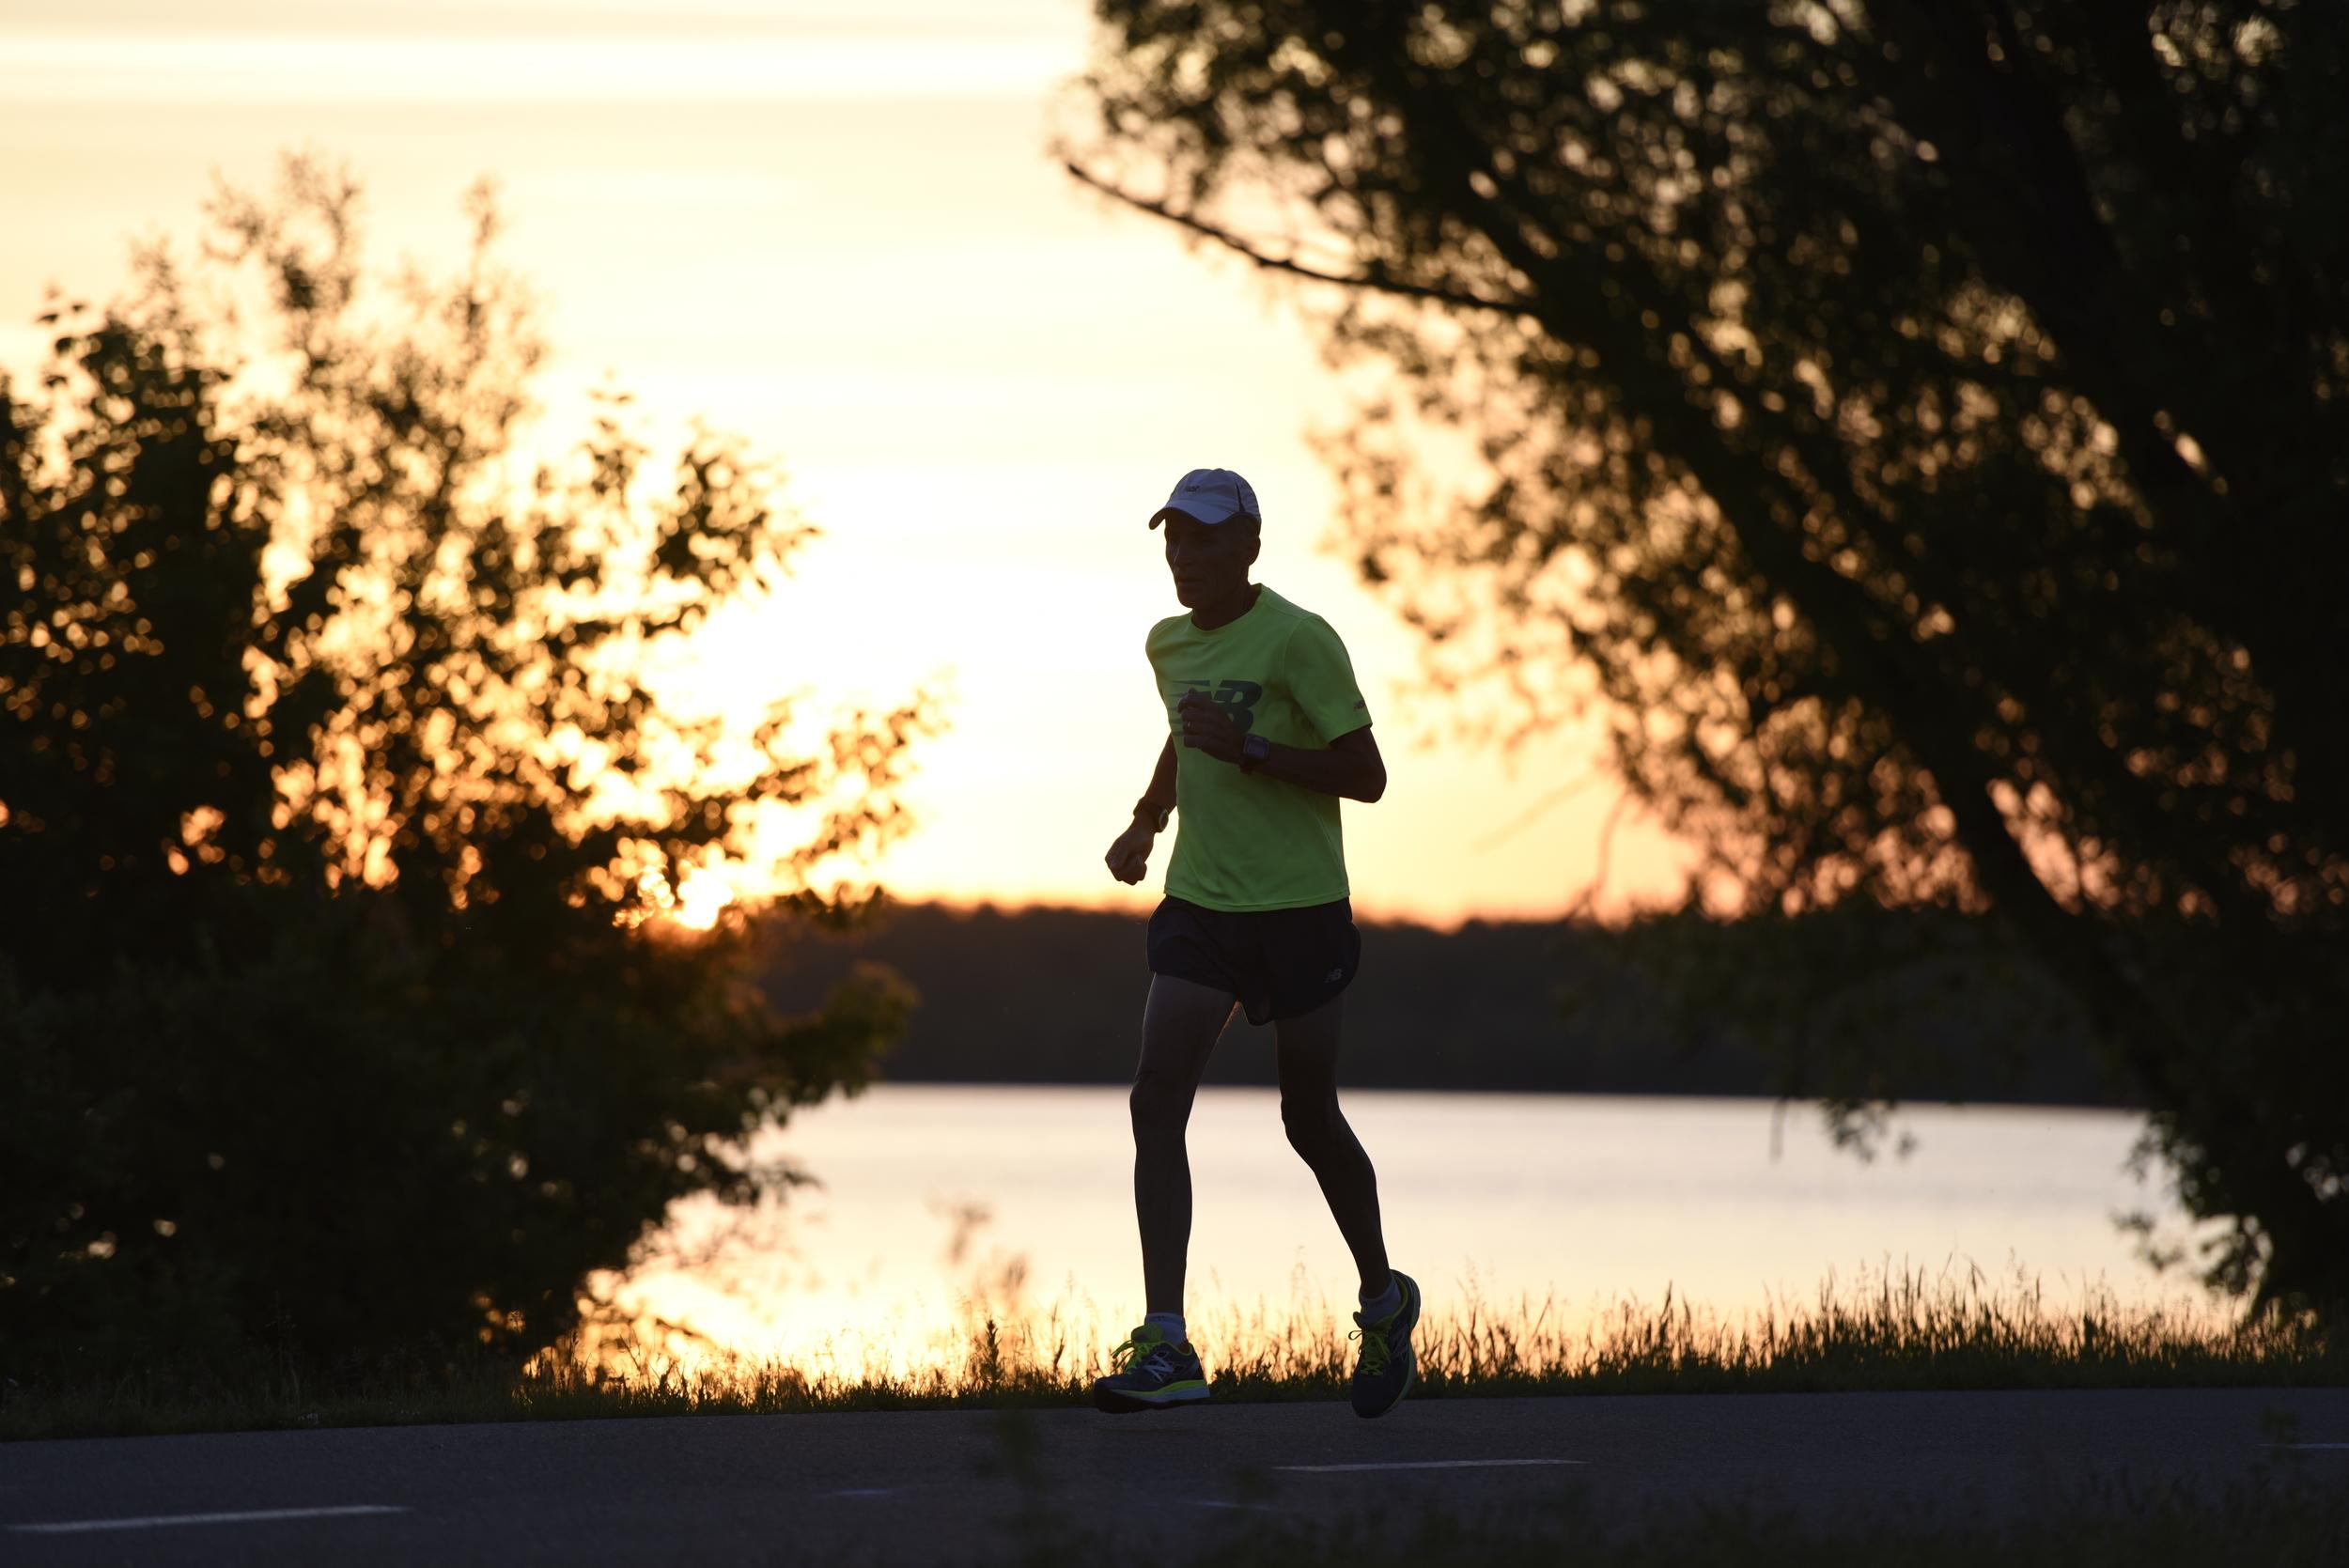 Dick Beardsley runs along the Paul Bunyan Trail as the sun rises in Bemidji. Beardsley was featured in a special 40th Grandma's Marathon edition of the Duluth News Tribune.